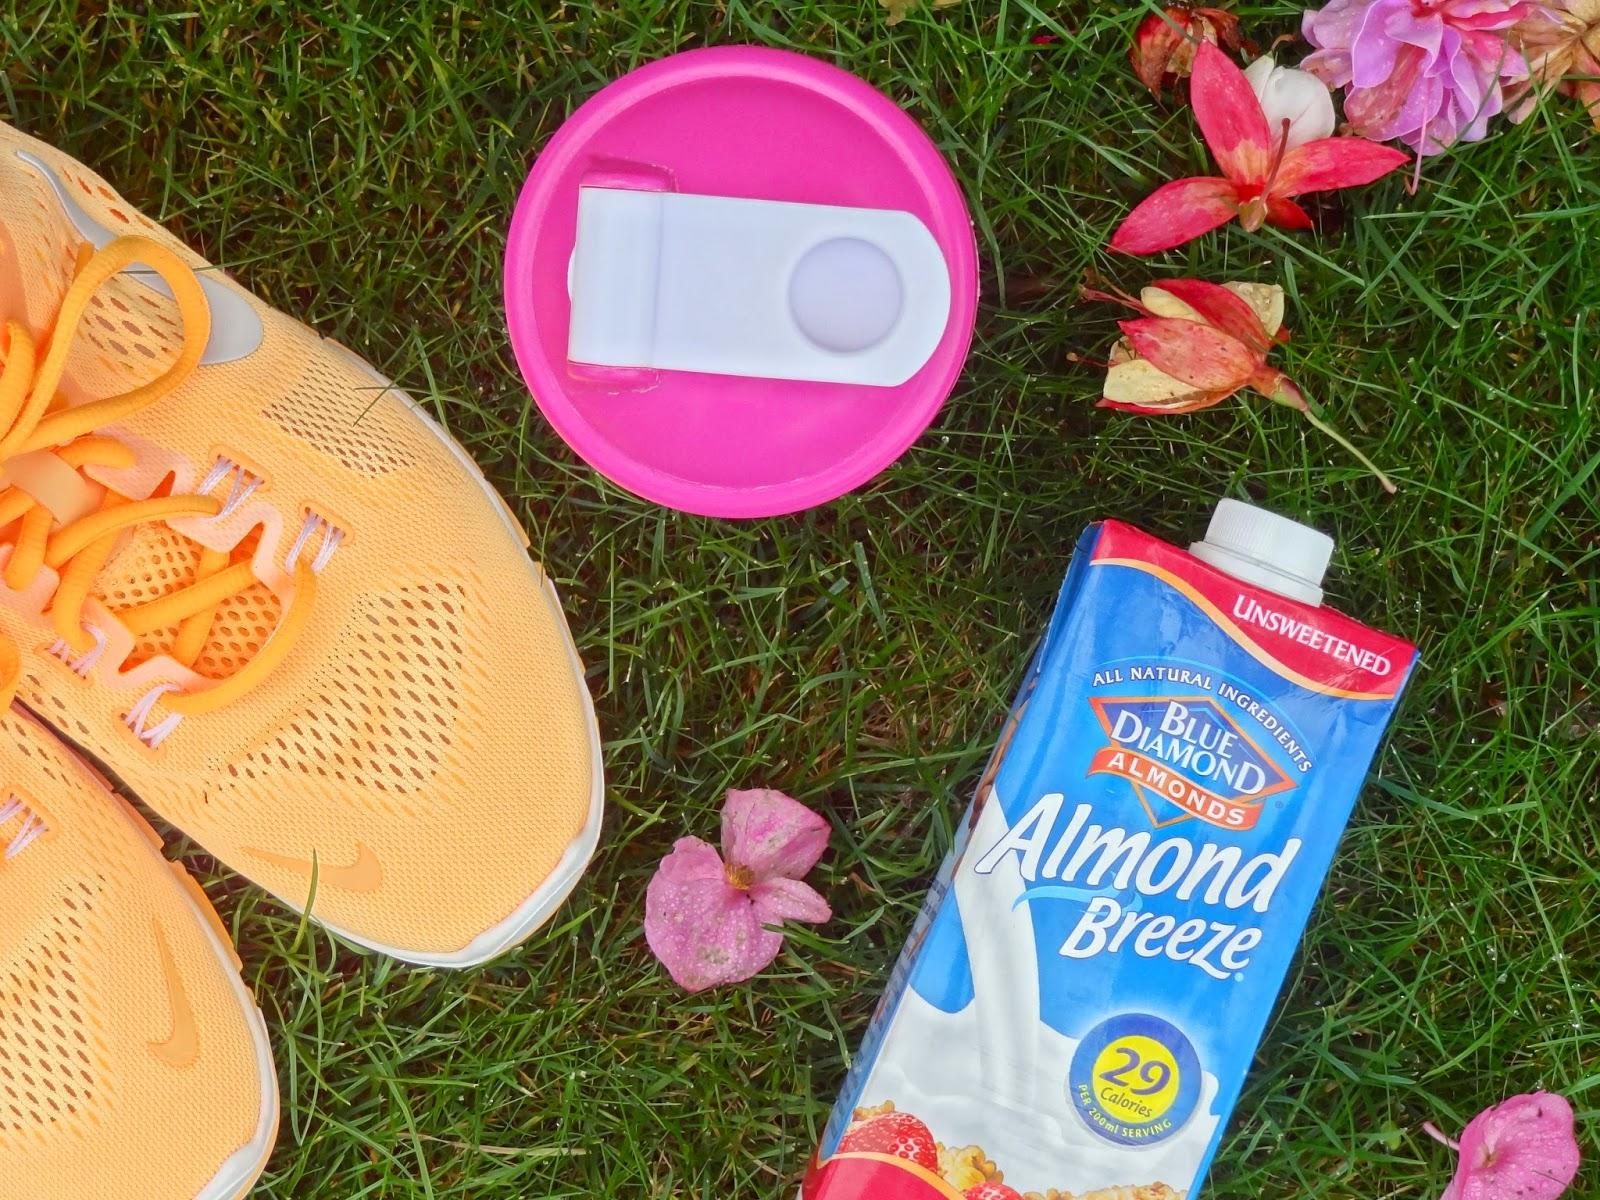 Blue Diamond Almond Breeze Milk Nike Protein Shake